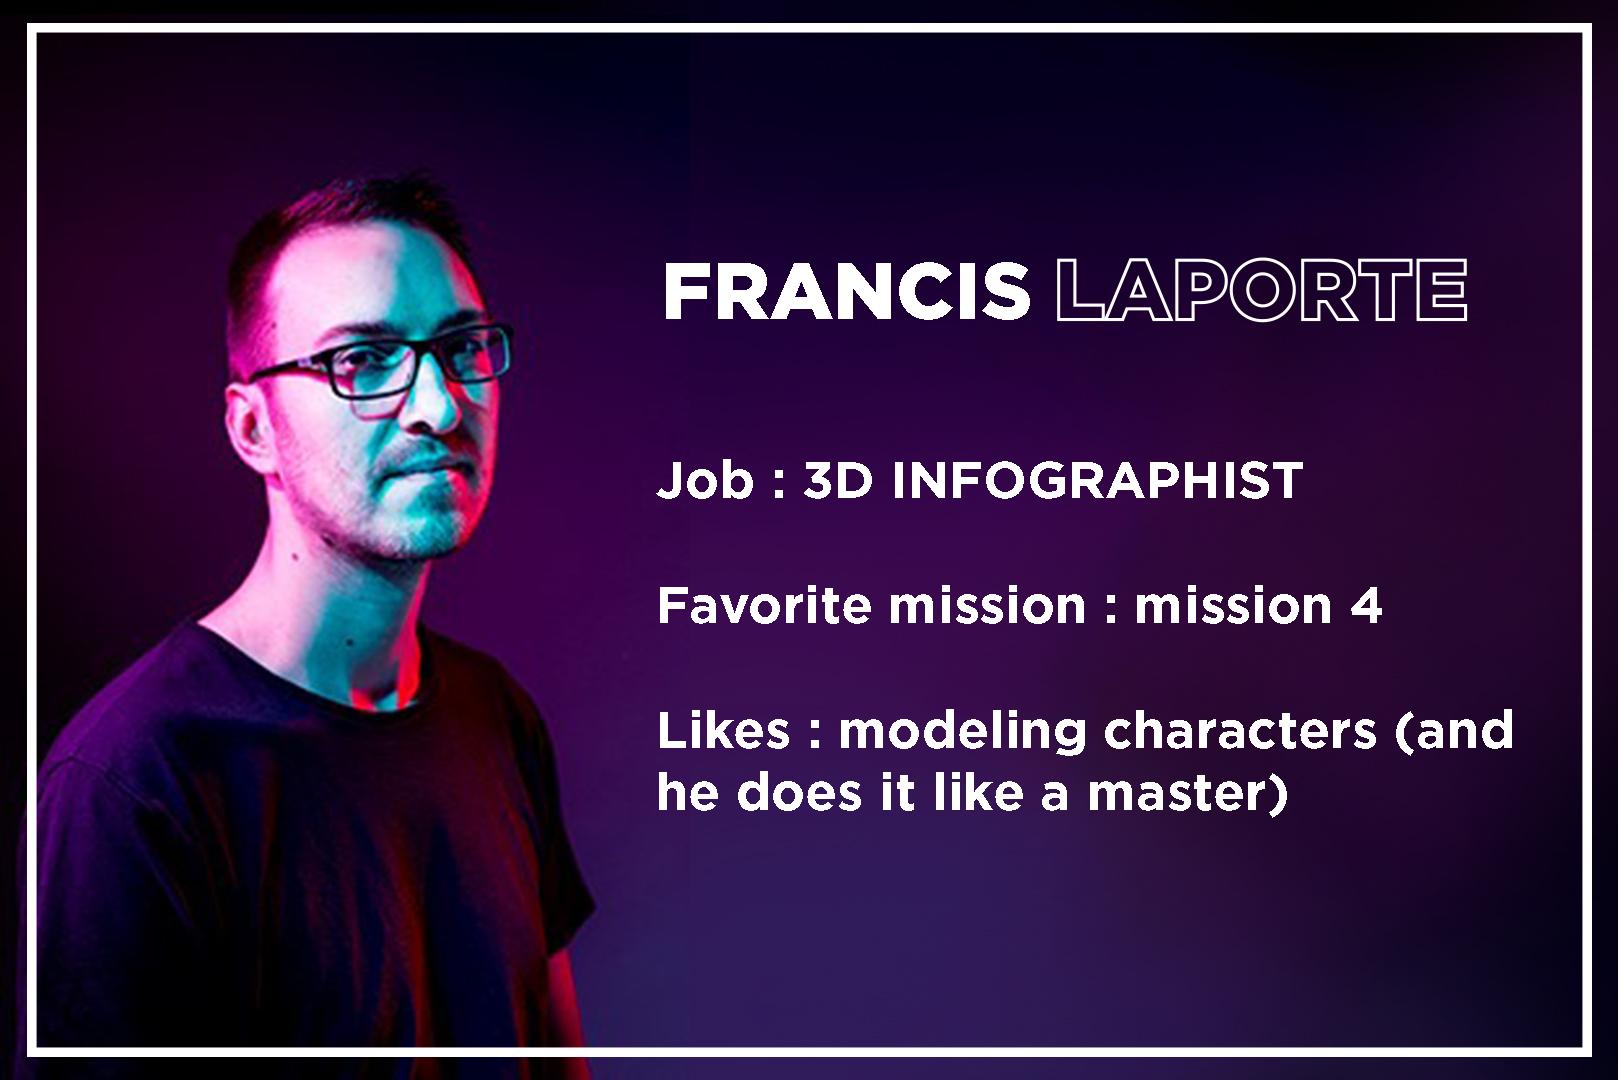 Francis Laporte 3D infographist in the game development studio